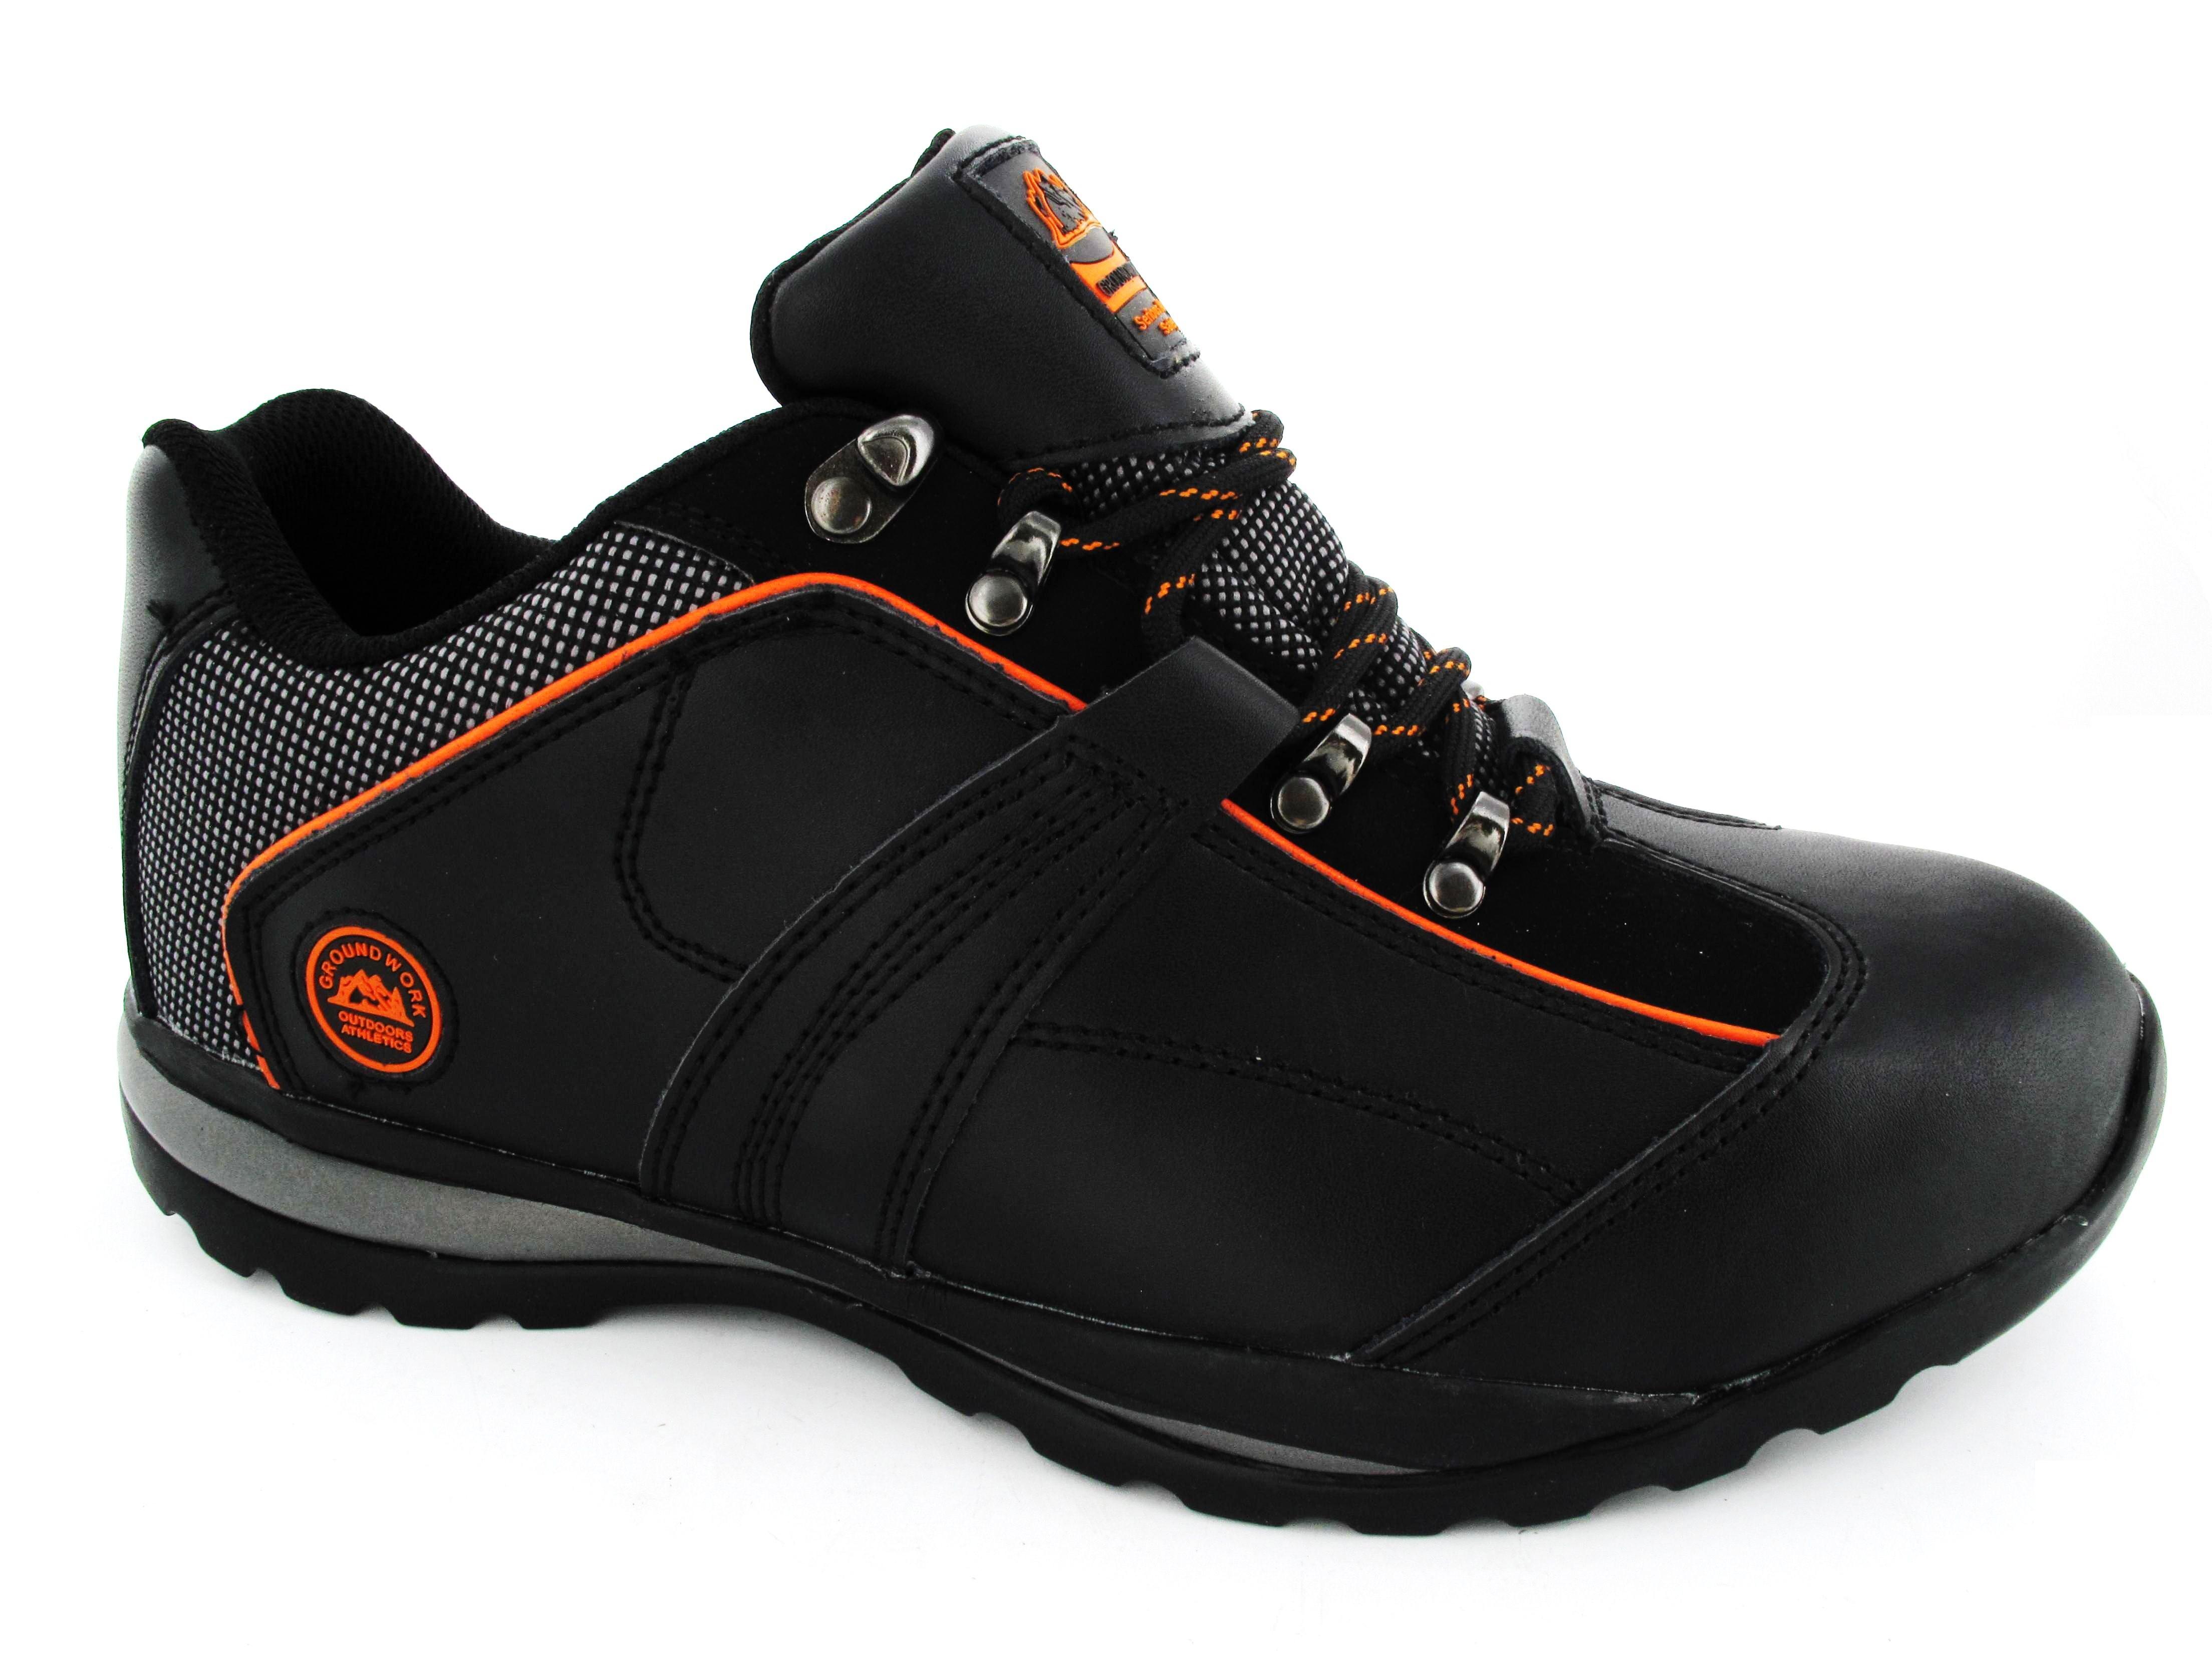 mens safety trainers groundwork black steel toe cap work. Black Bedroom Furniture Sets. Home Design Ideas